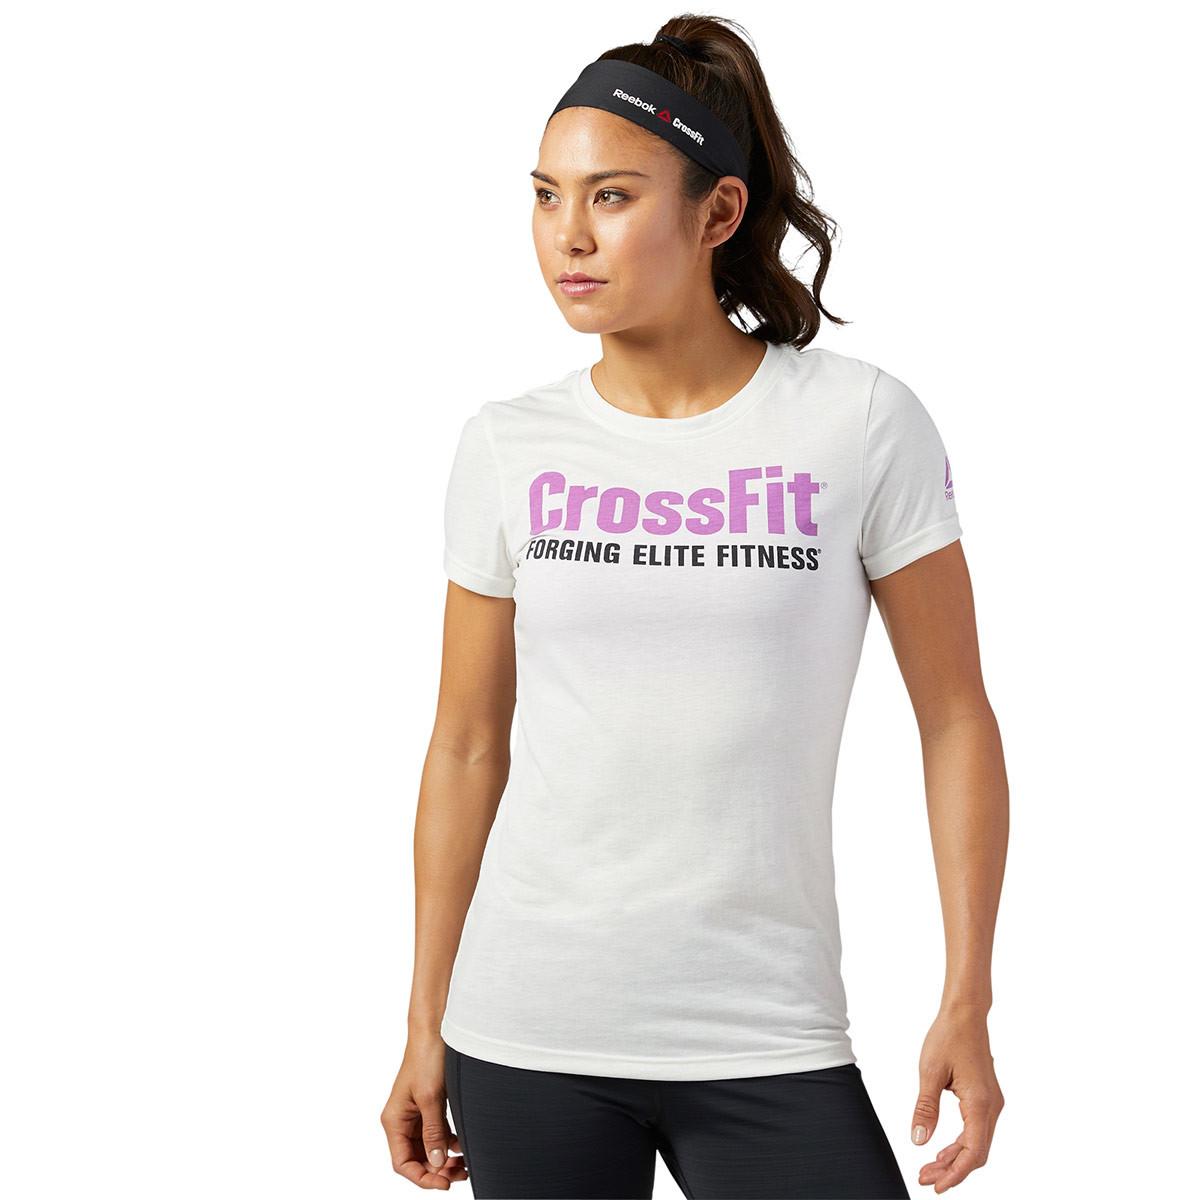 a3eb092ef1a7cb Reebok Fef Speedwick New Shirt Short Sleeve - Fitness tops for Women -  White